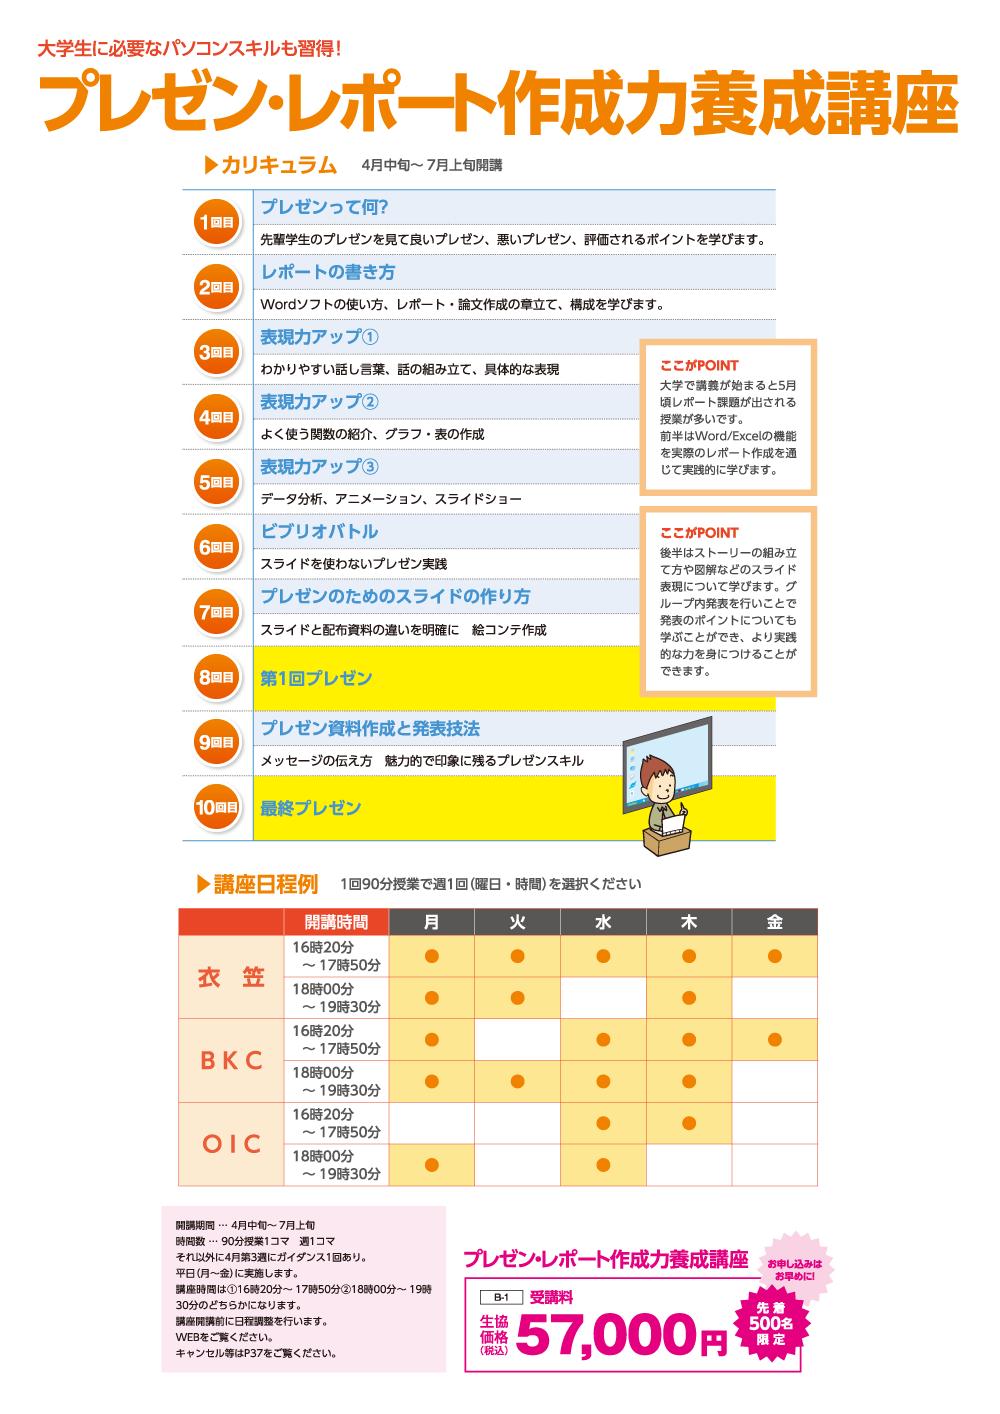 http://www.ritsco-op.jp/pickup/20170331_img03.png